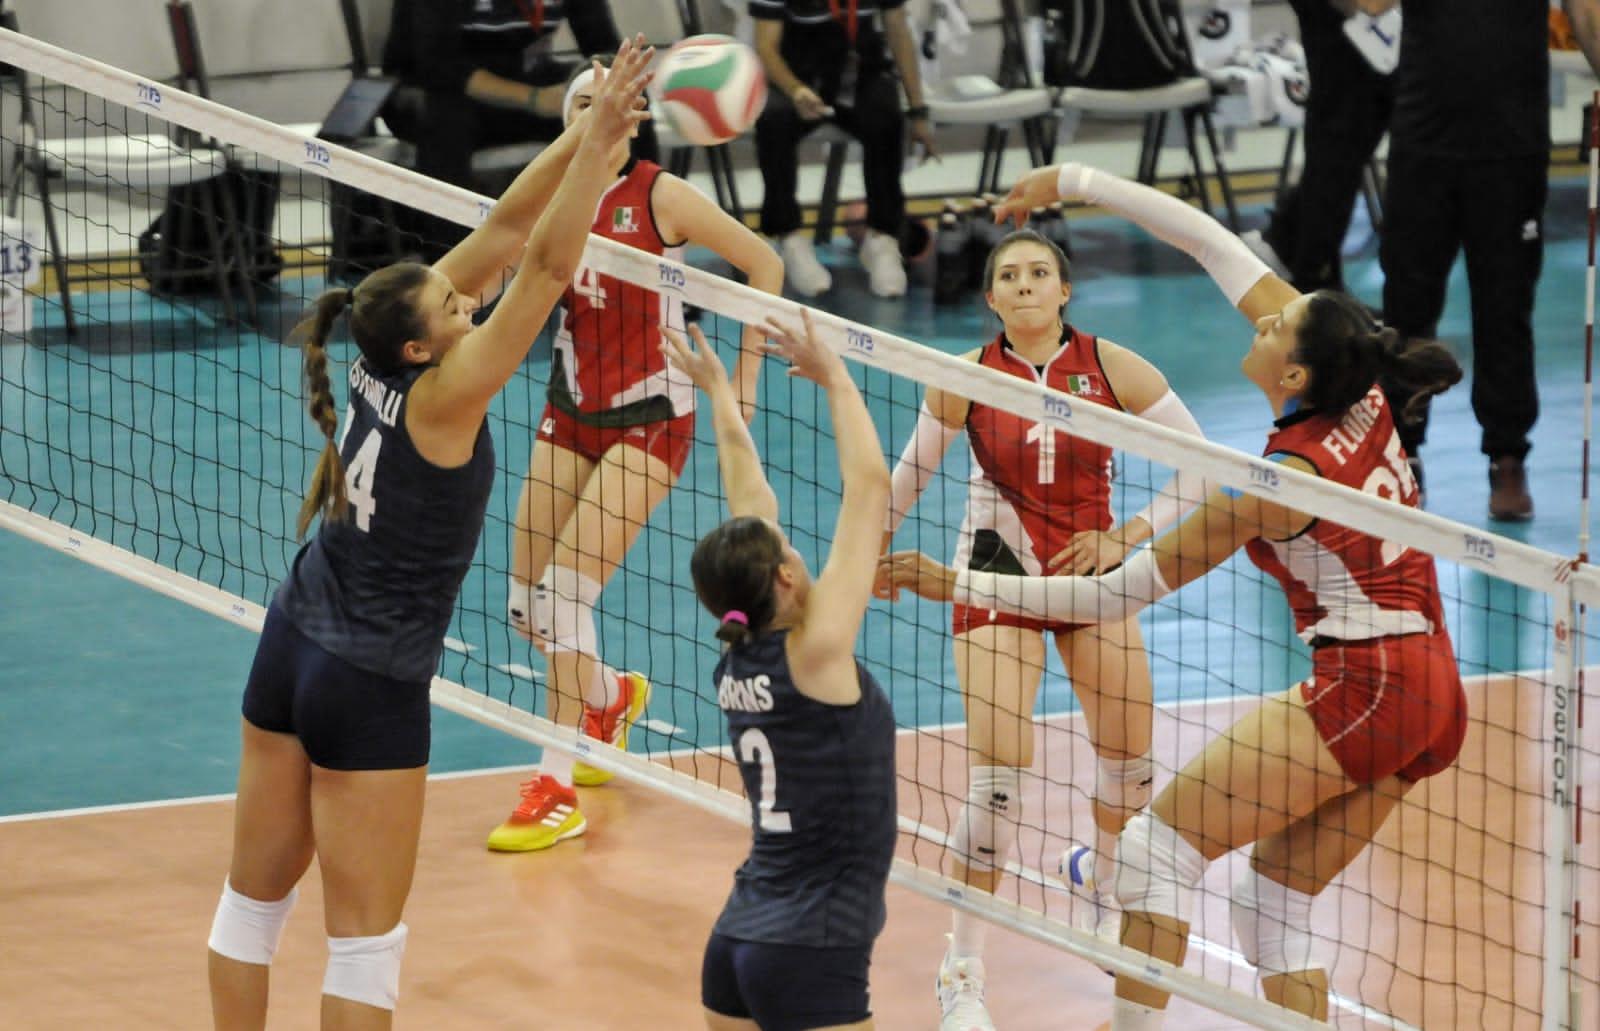 Estados Unidos dispone 3-1 de México en voleibol femenino